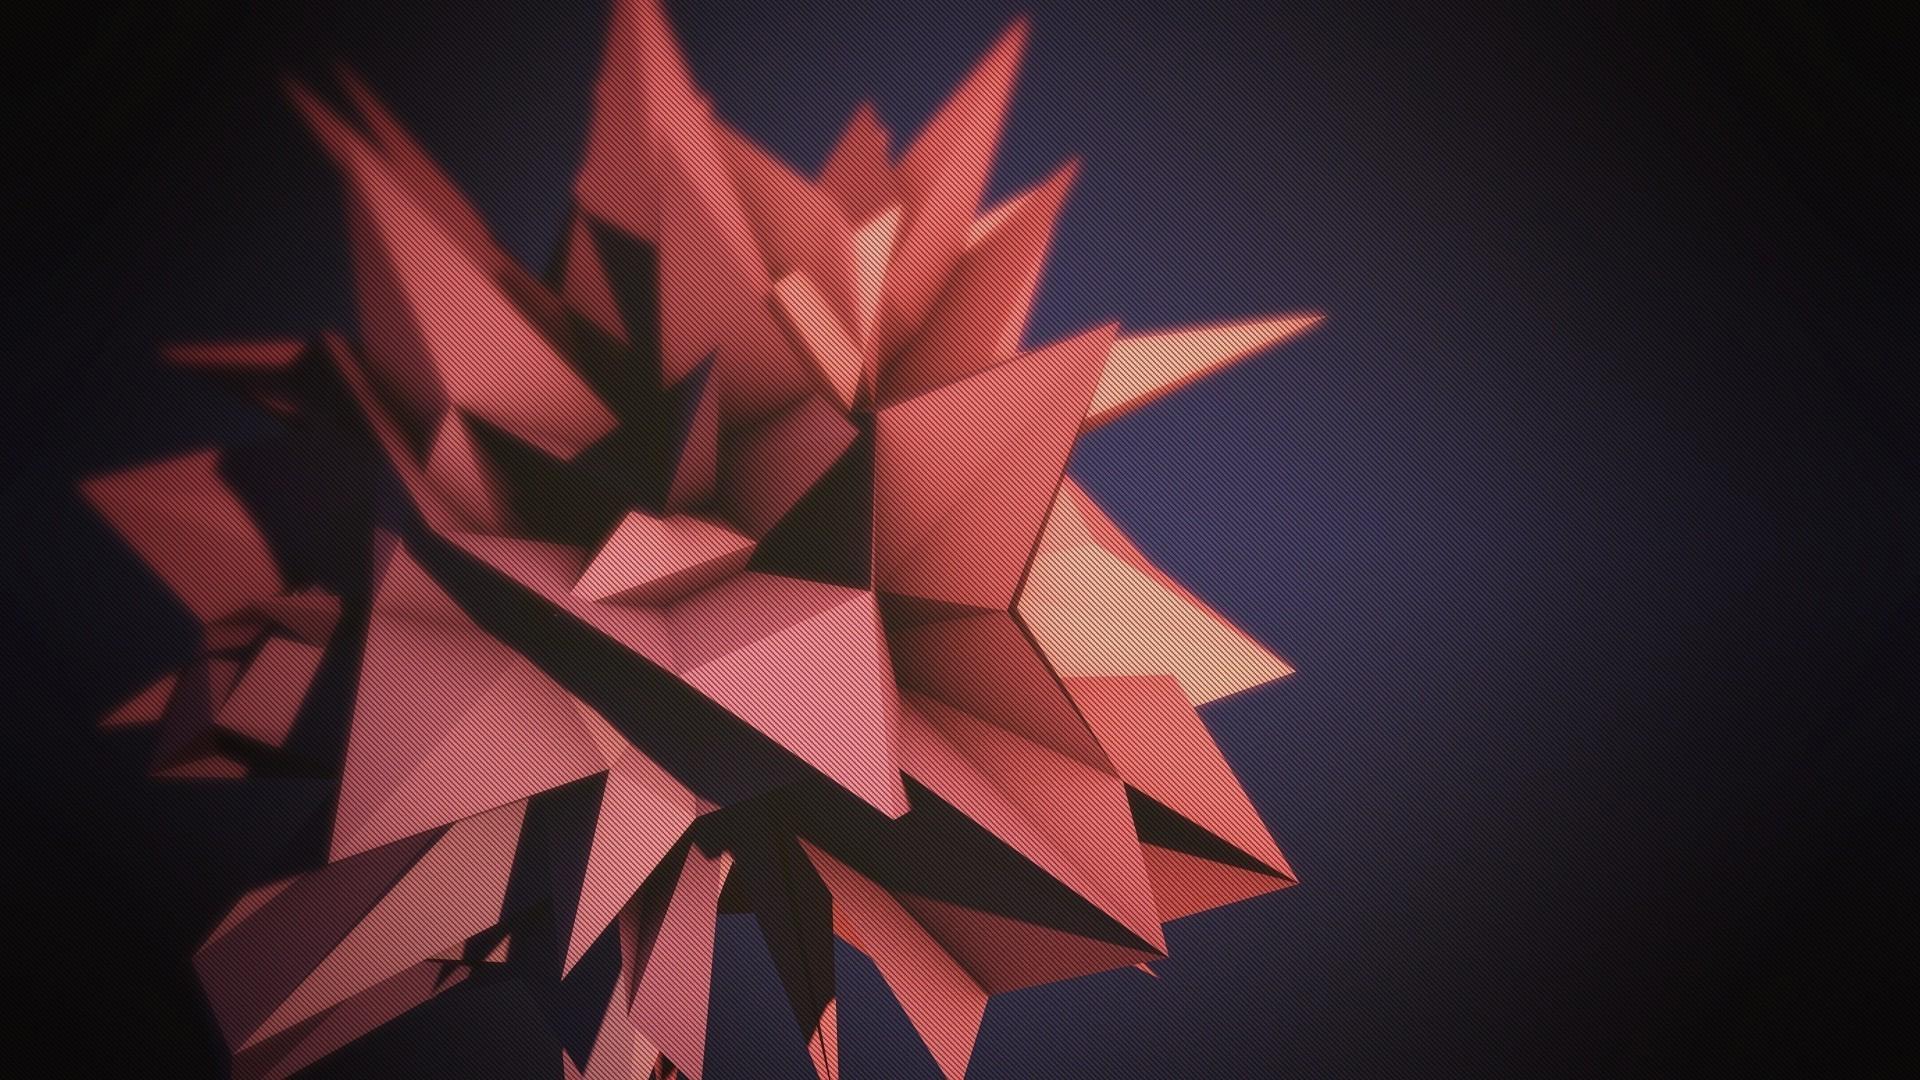 Polygons 31609 1920x1080 Px Hdwallsource Com